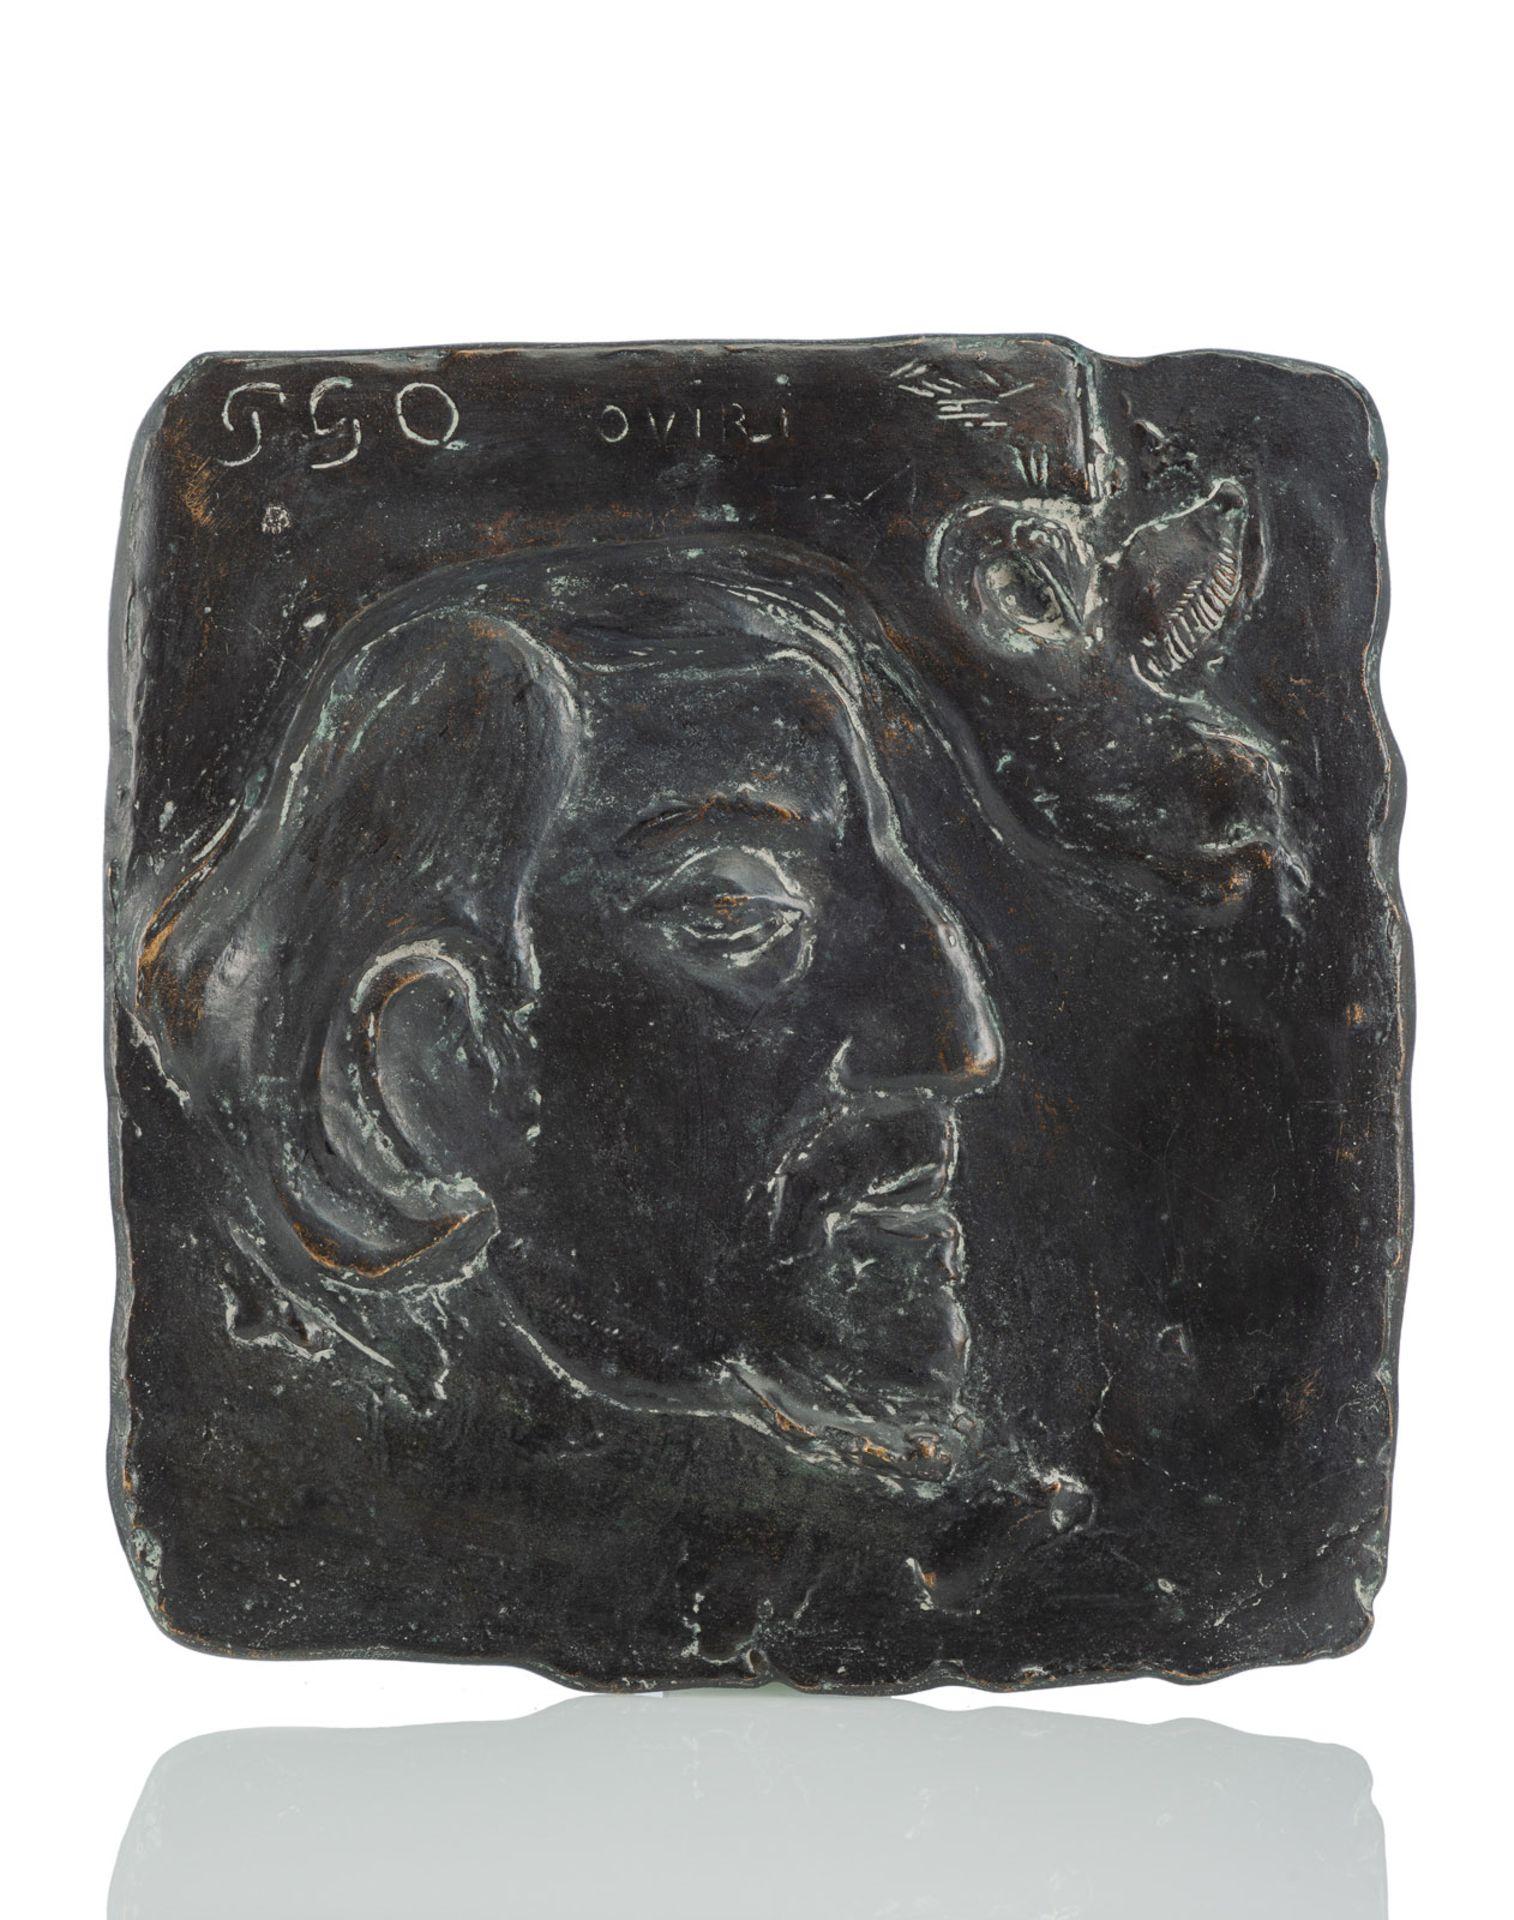 Gauguin, Paul